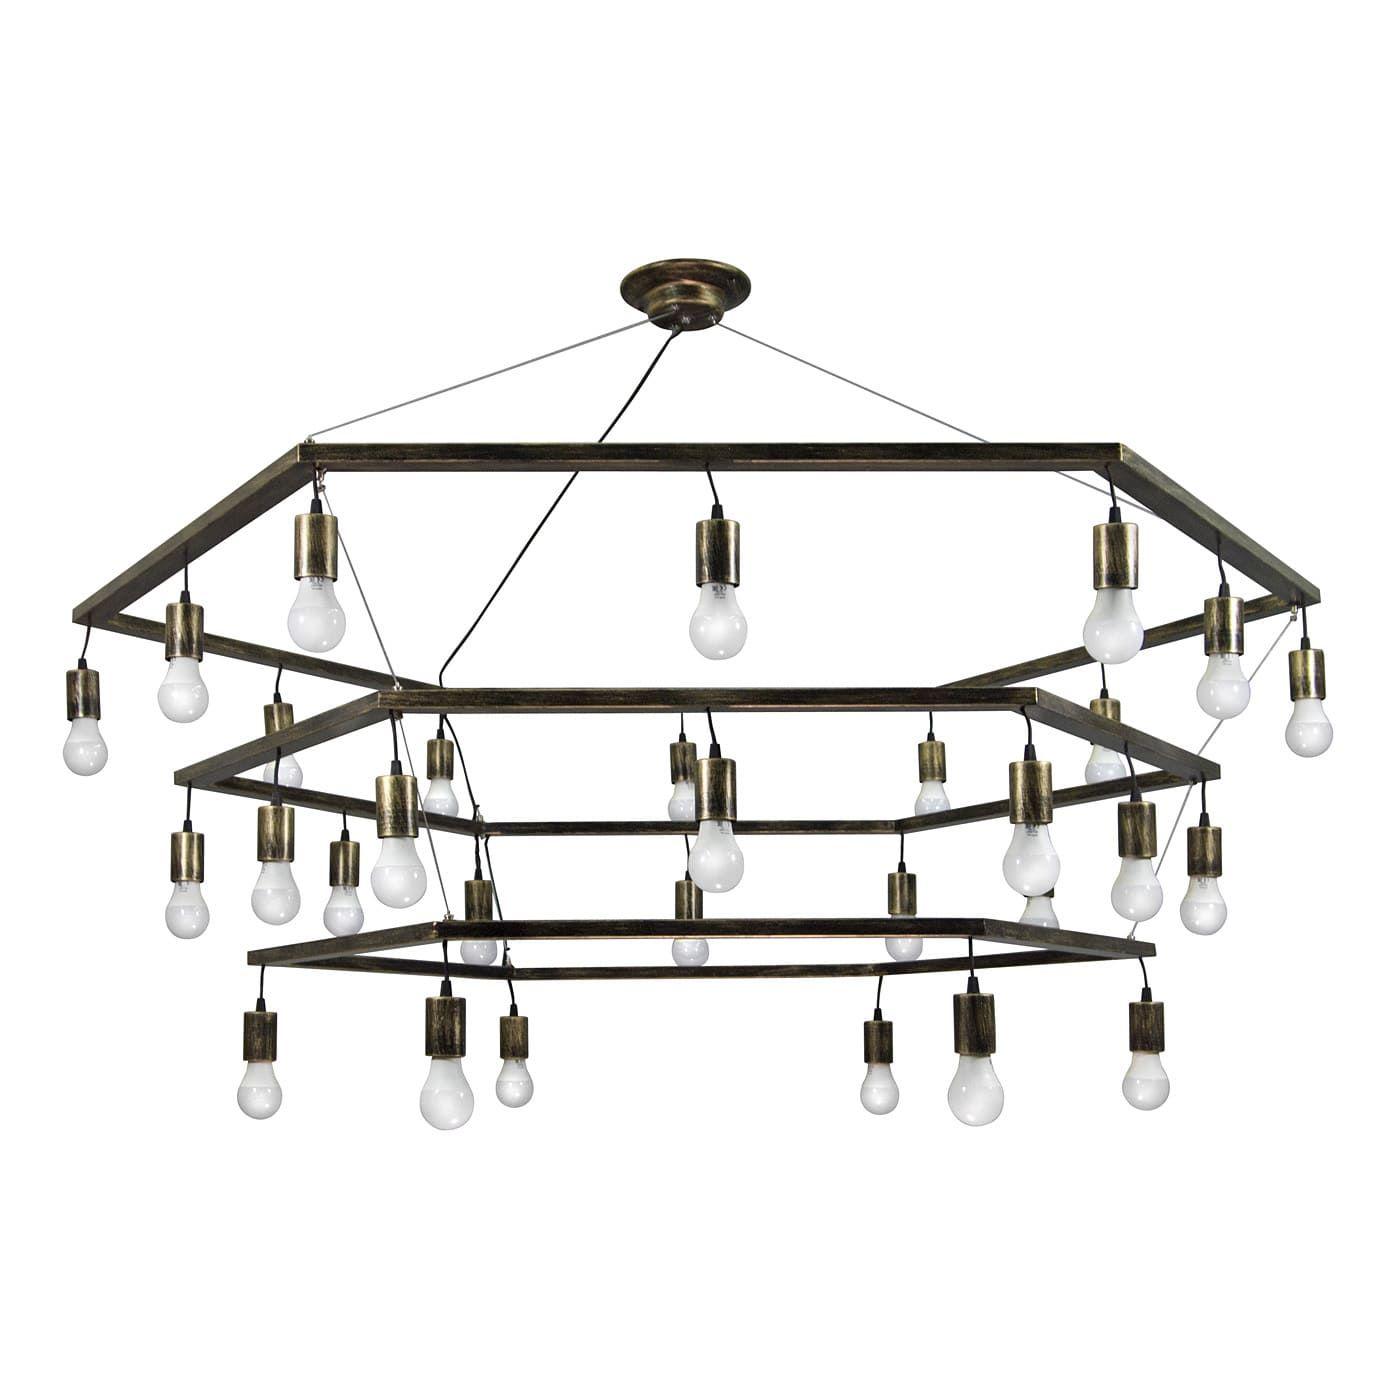 PETRASVET / Pendant chandelier S3122-30, 30xE27 max. 60W